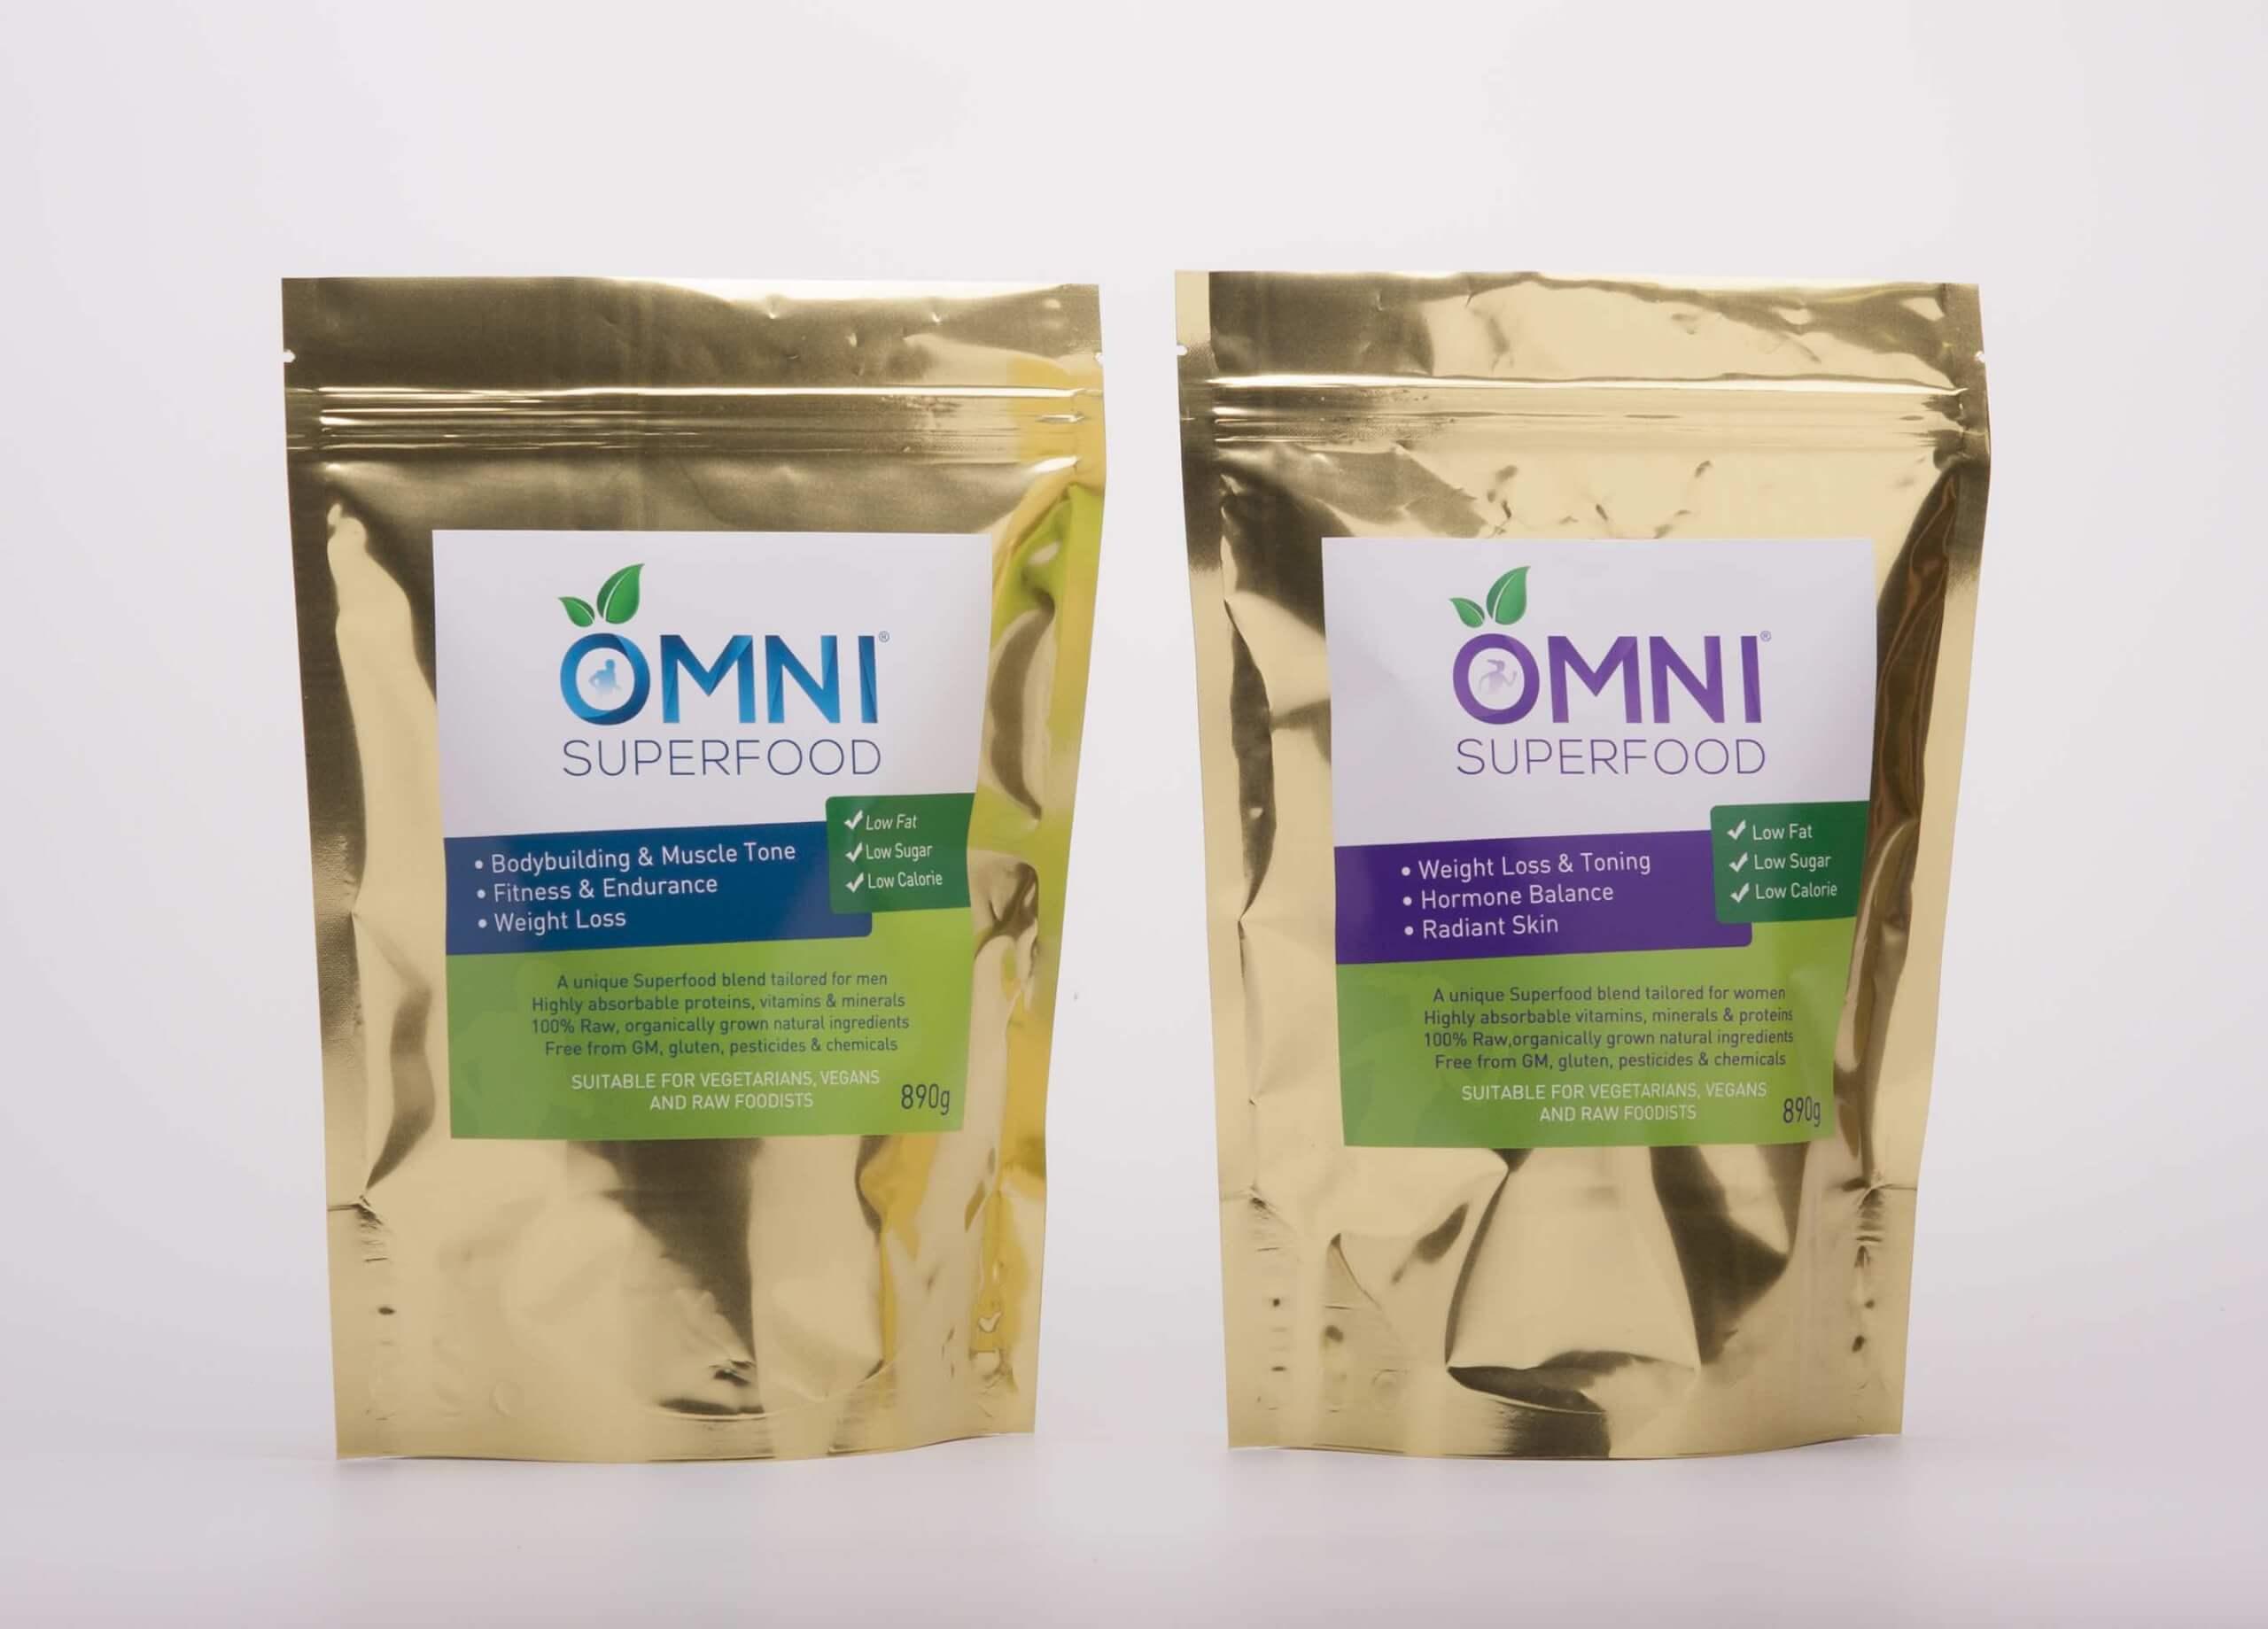 OMNI Superfood - Male & Female